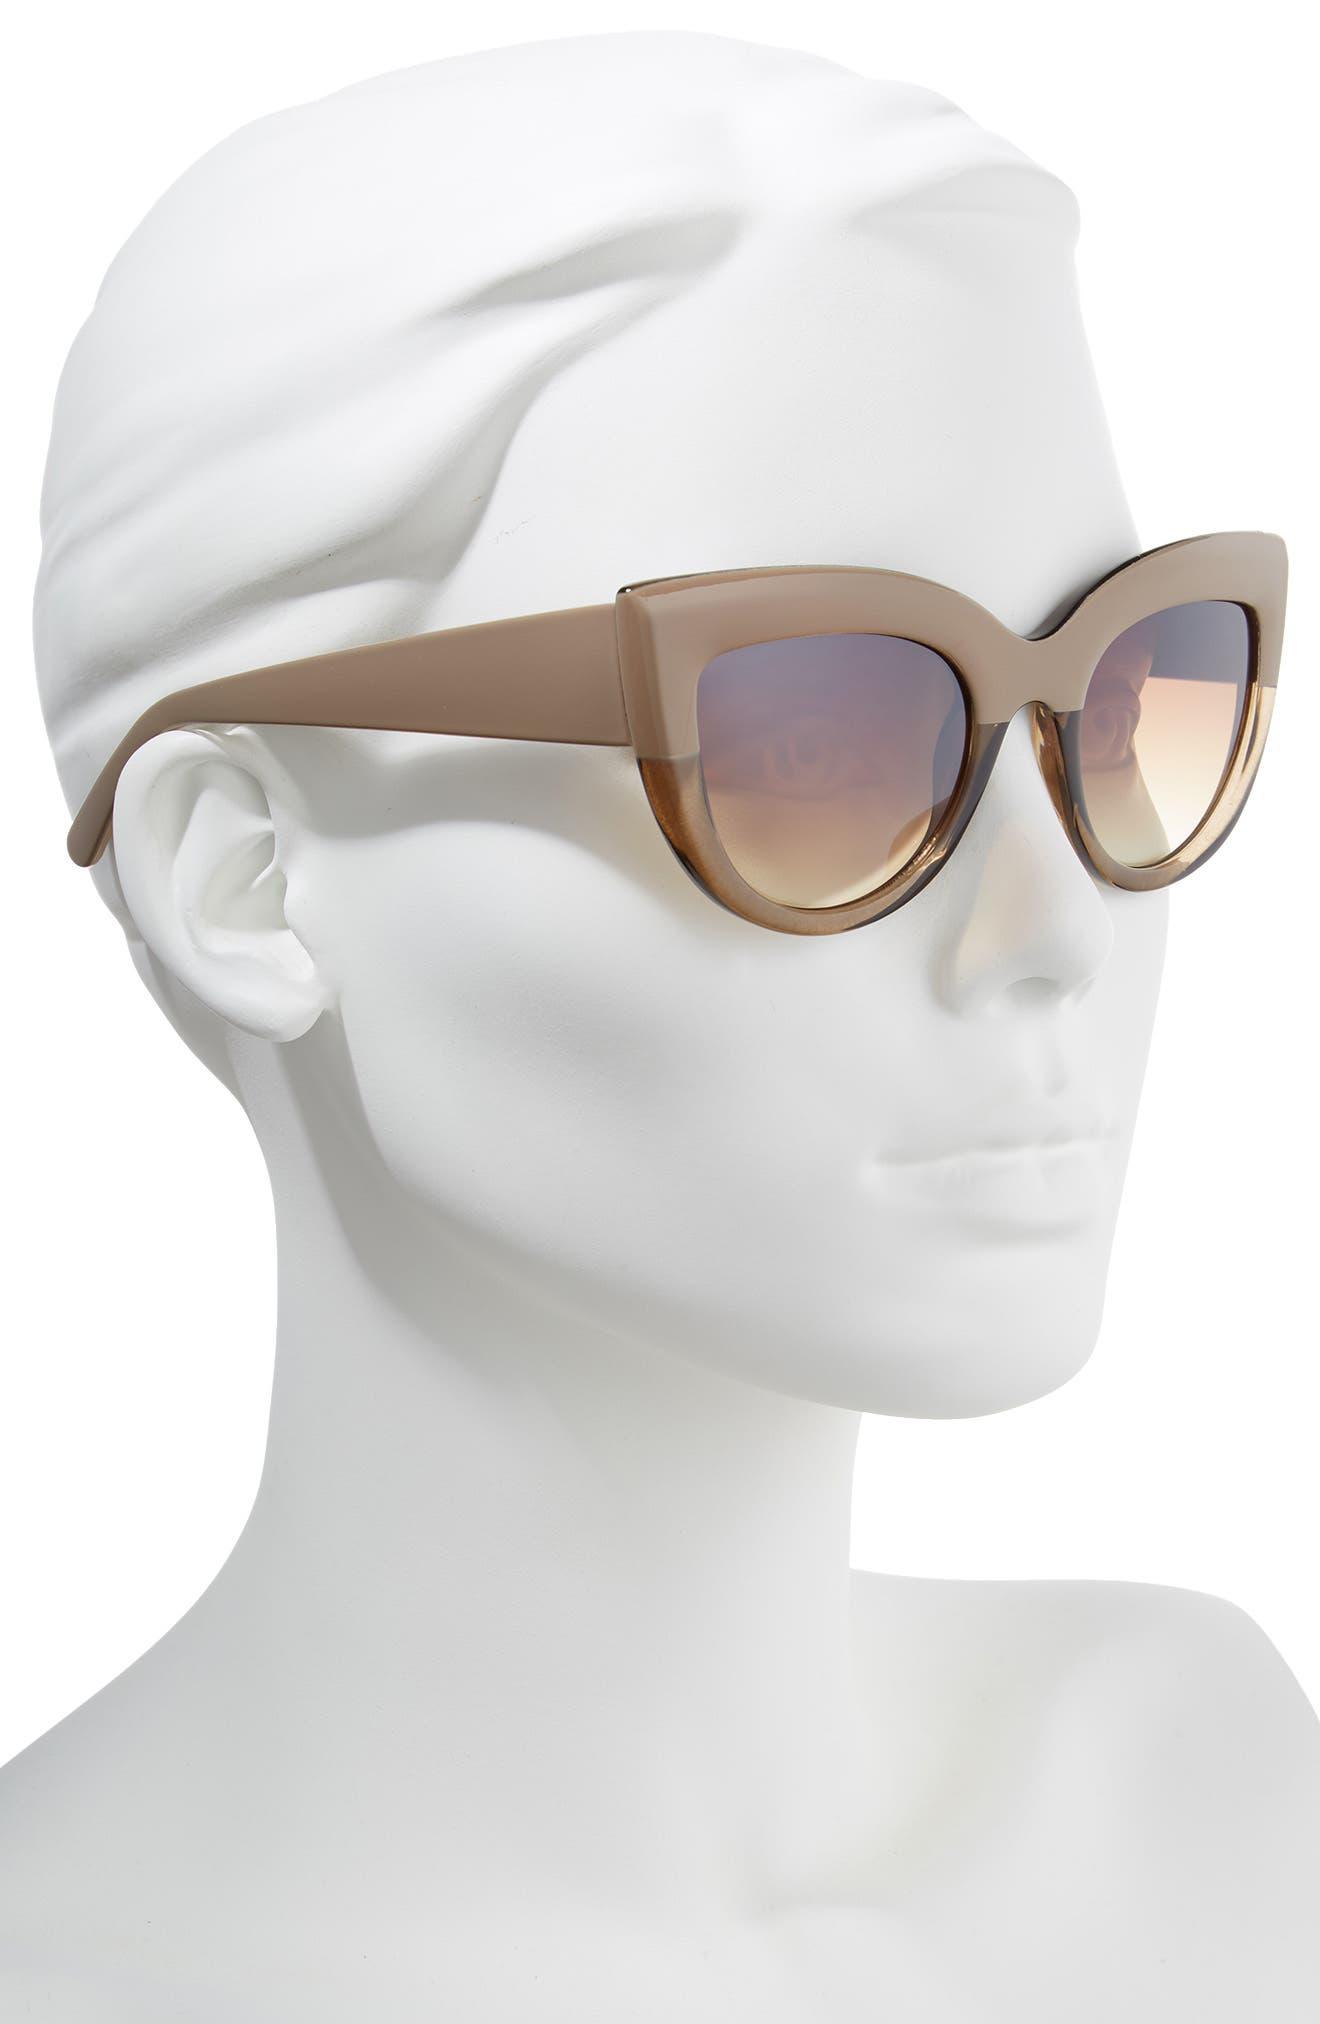 60mm Two-Tone Cat Eye Sunglasses,                             Alternate thumbnail 2, color,